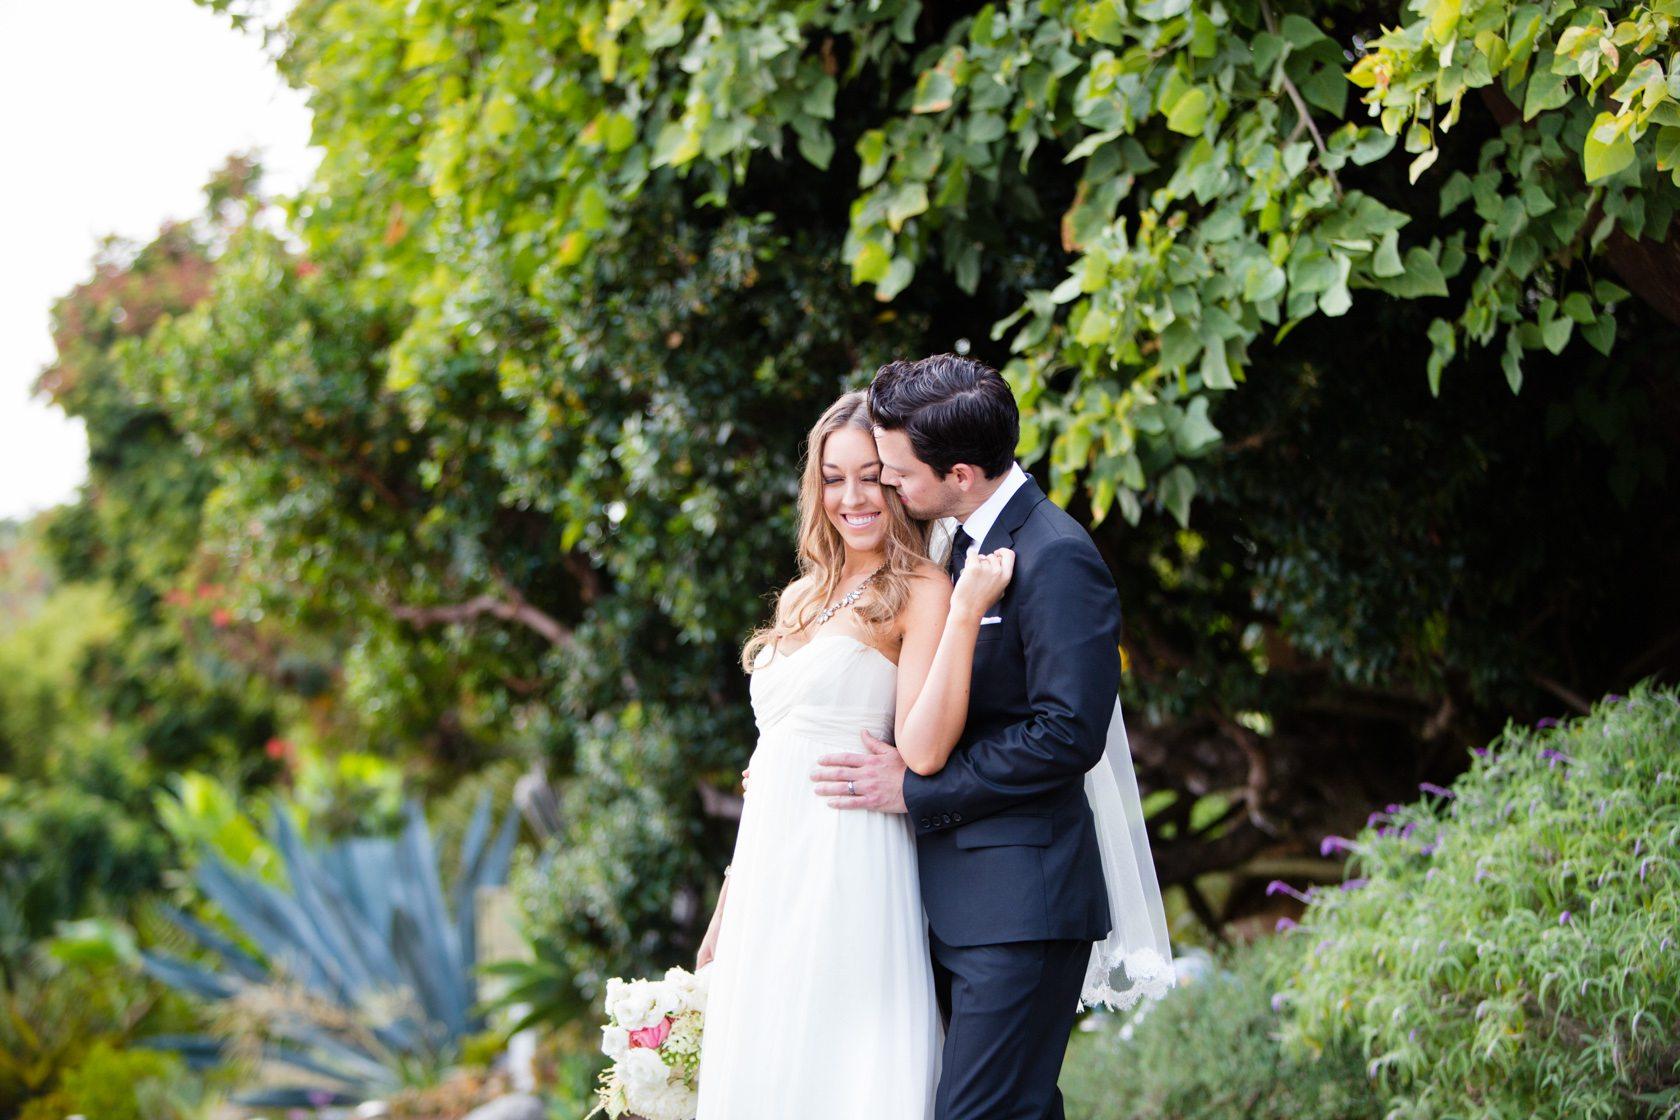 San_Diego_Botanic_Gardens_Wedding_059.jpg